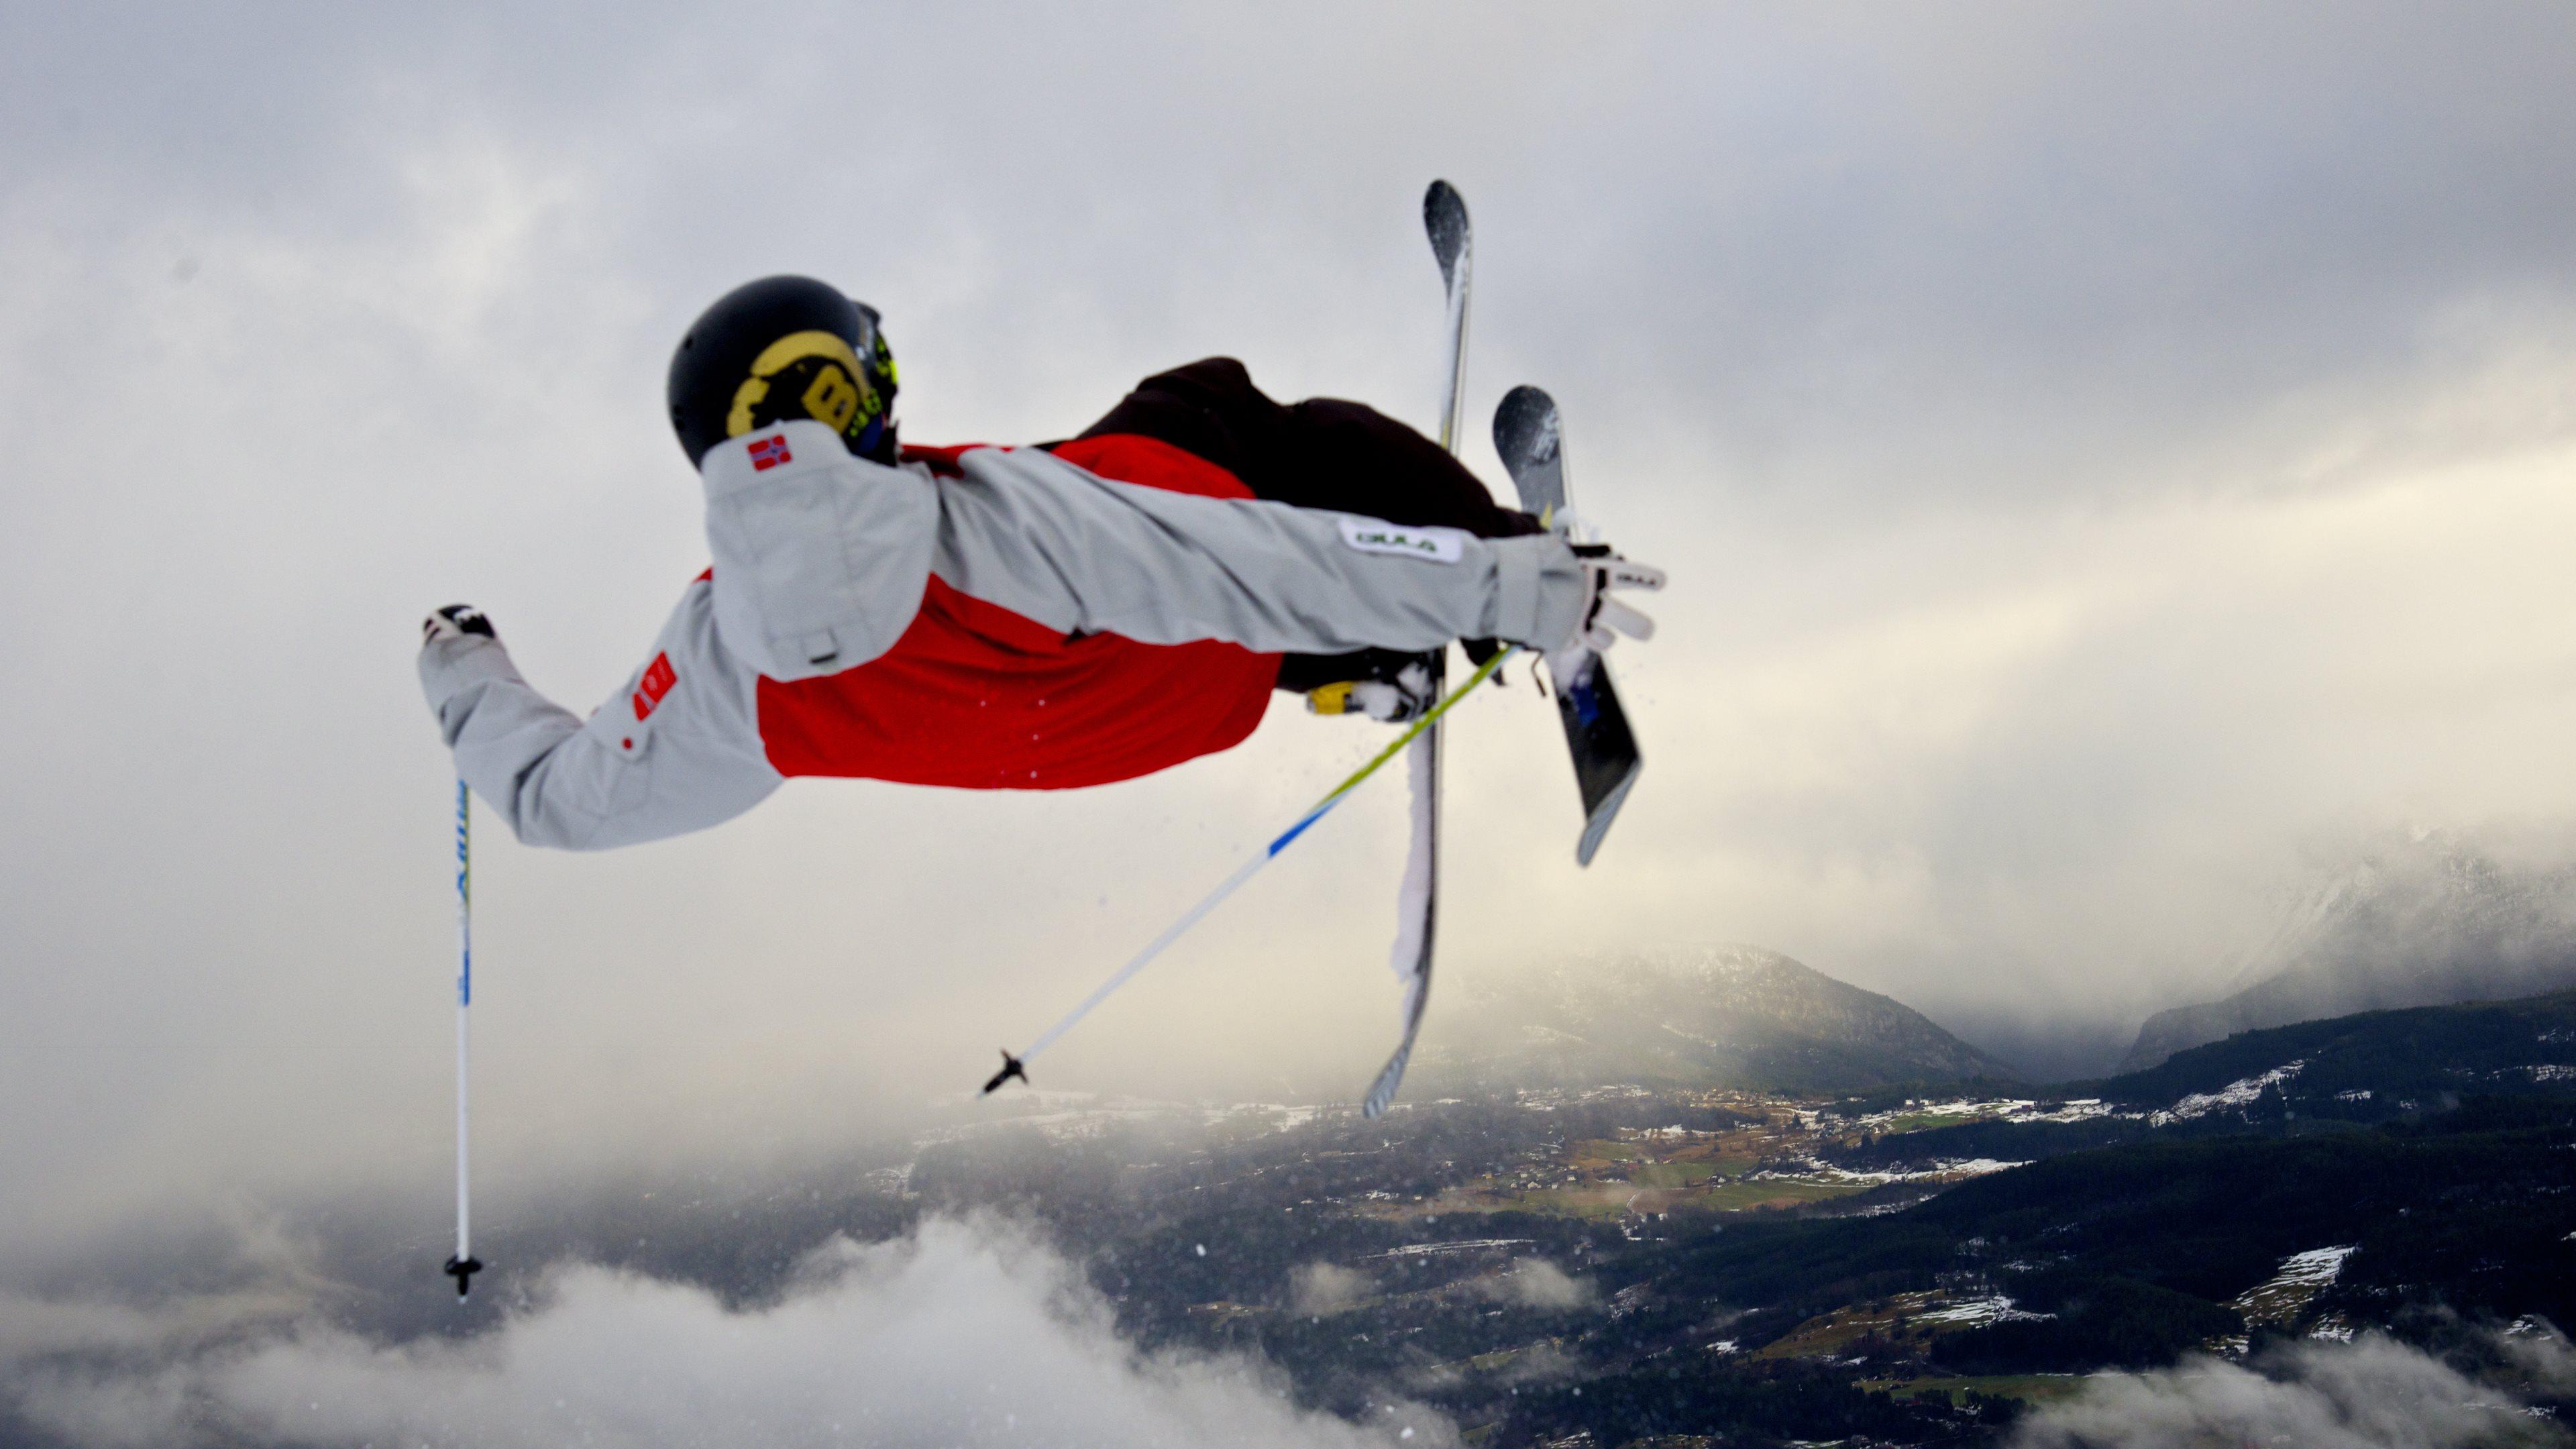 freestyle skiing wallpaper - photo #2